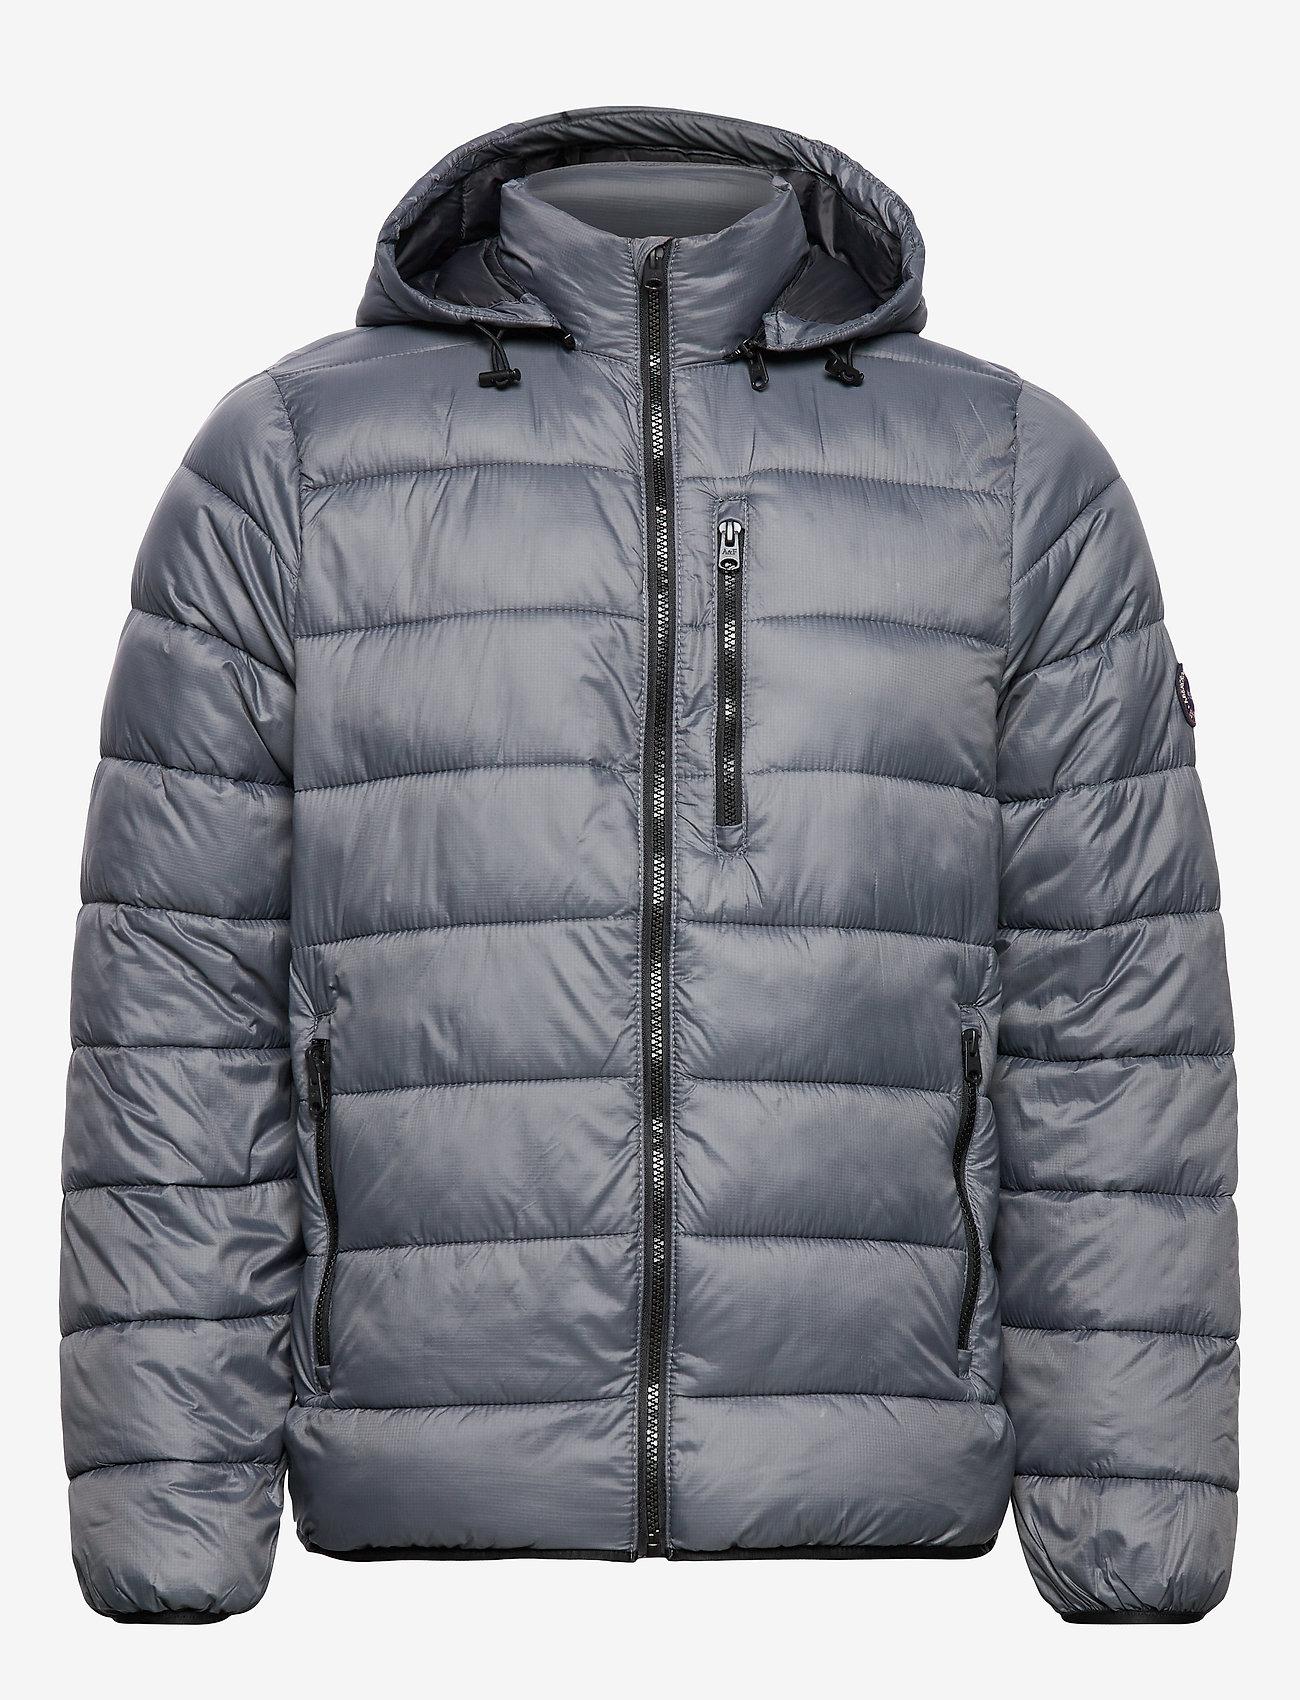 Abercrombie & Fitch Lightweight Primaloft Puffer - Jackets & Coats